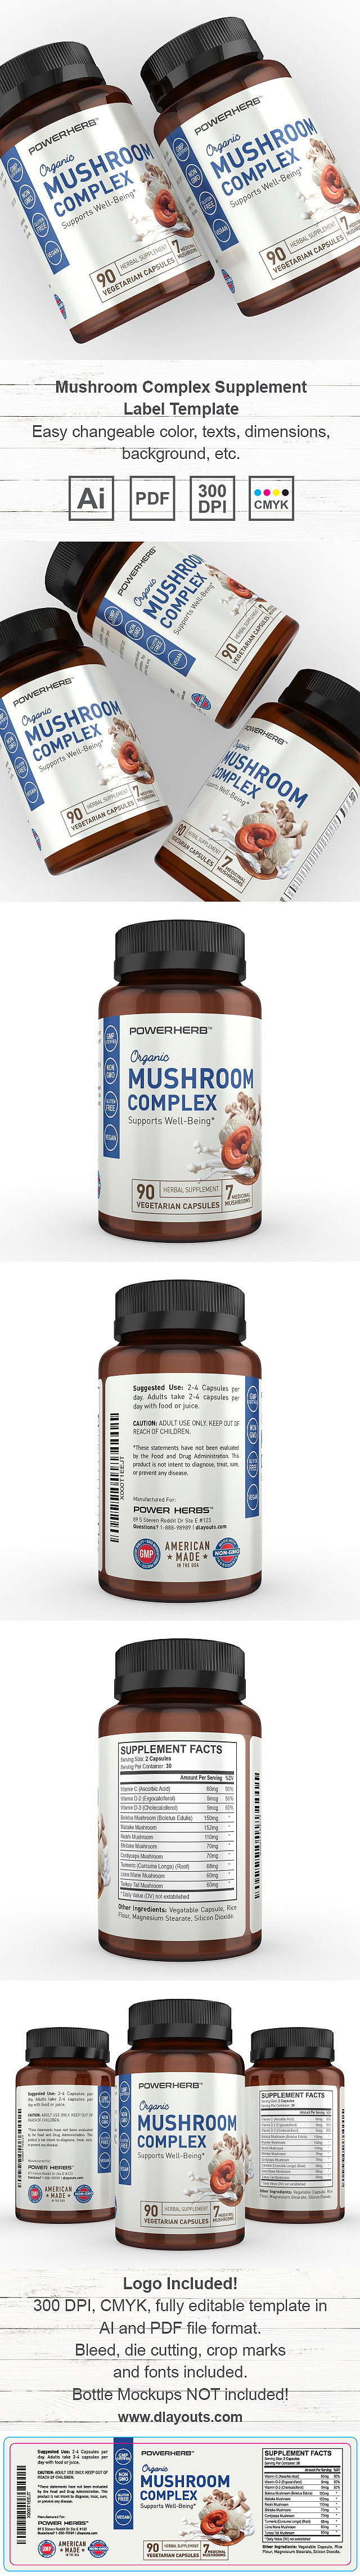 Mushroom Complex Supplement Label Template